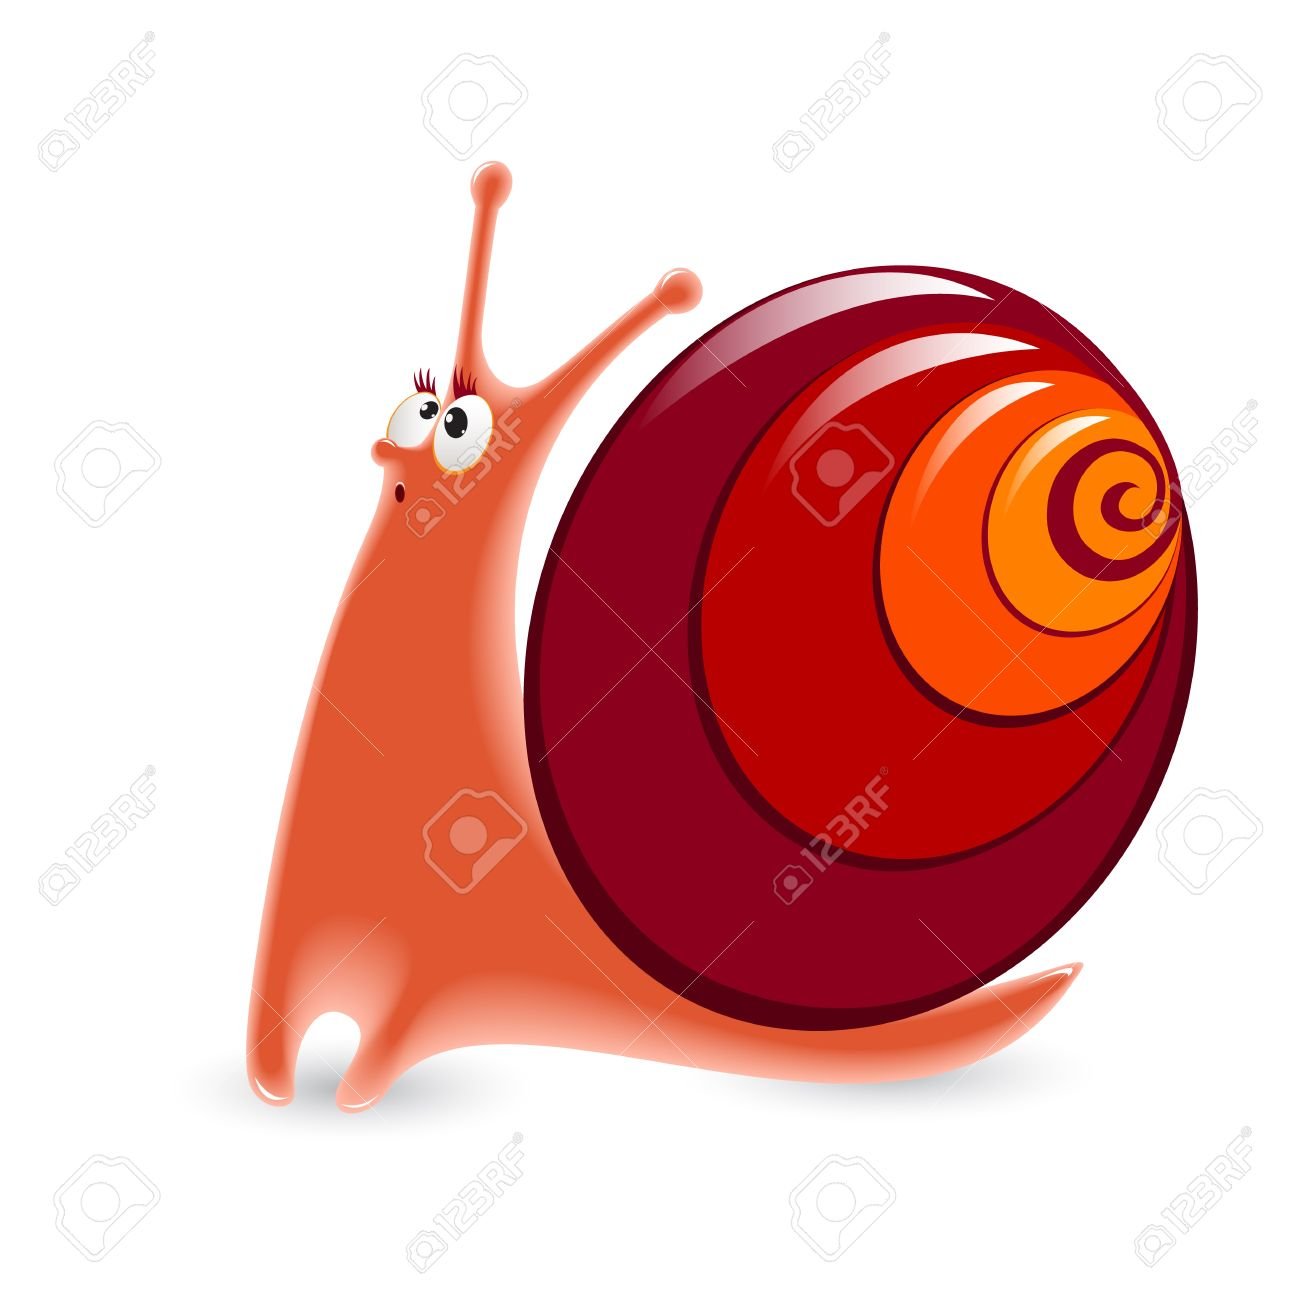 Cartoon Snail. Illustration isolated on white background. Stock Vector - 10774568